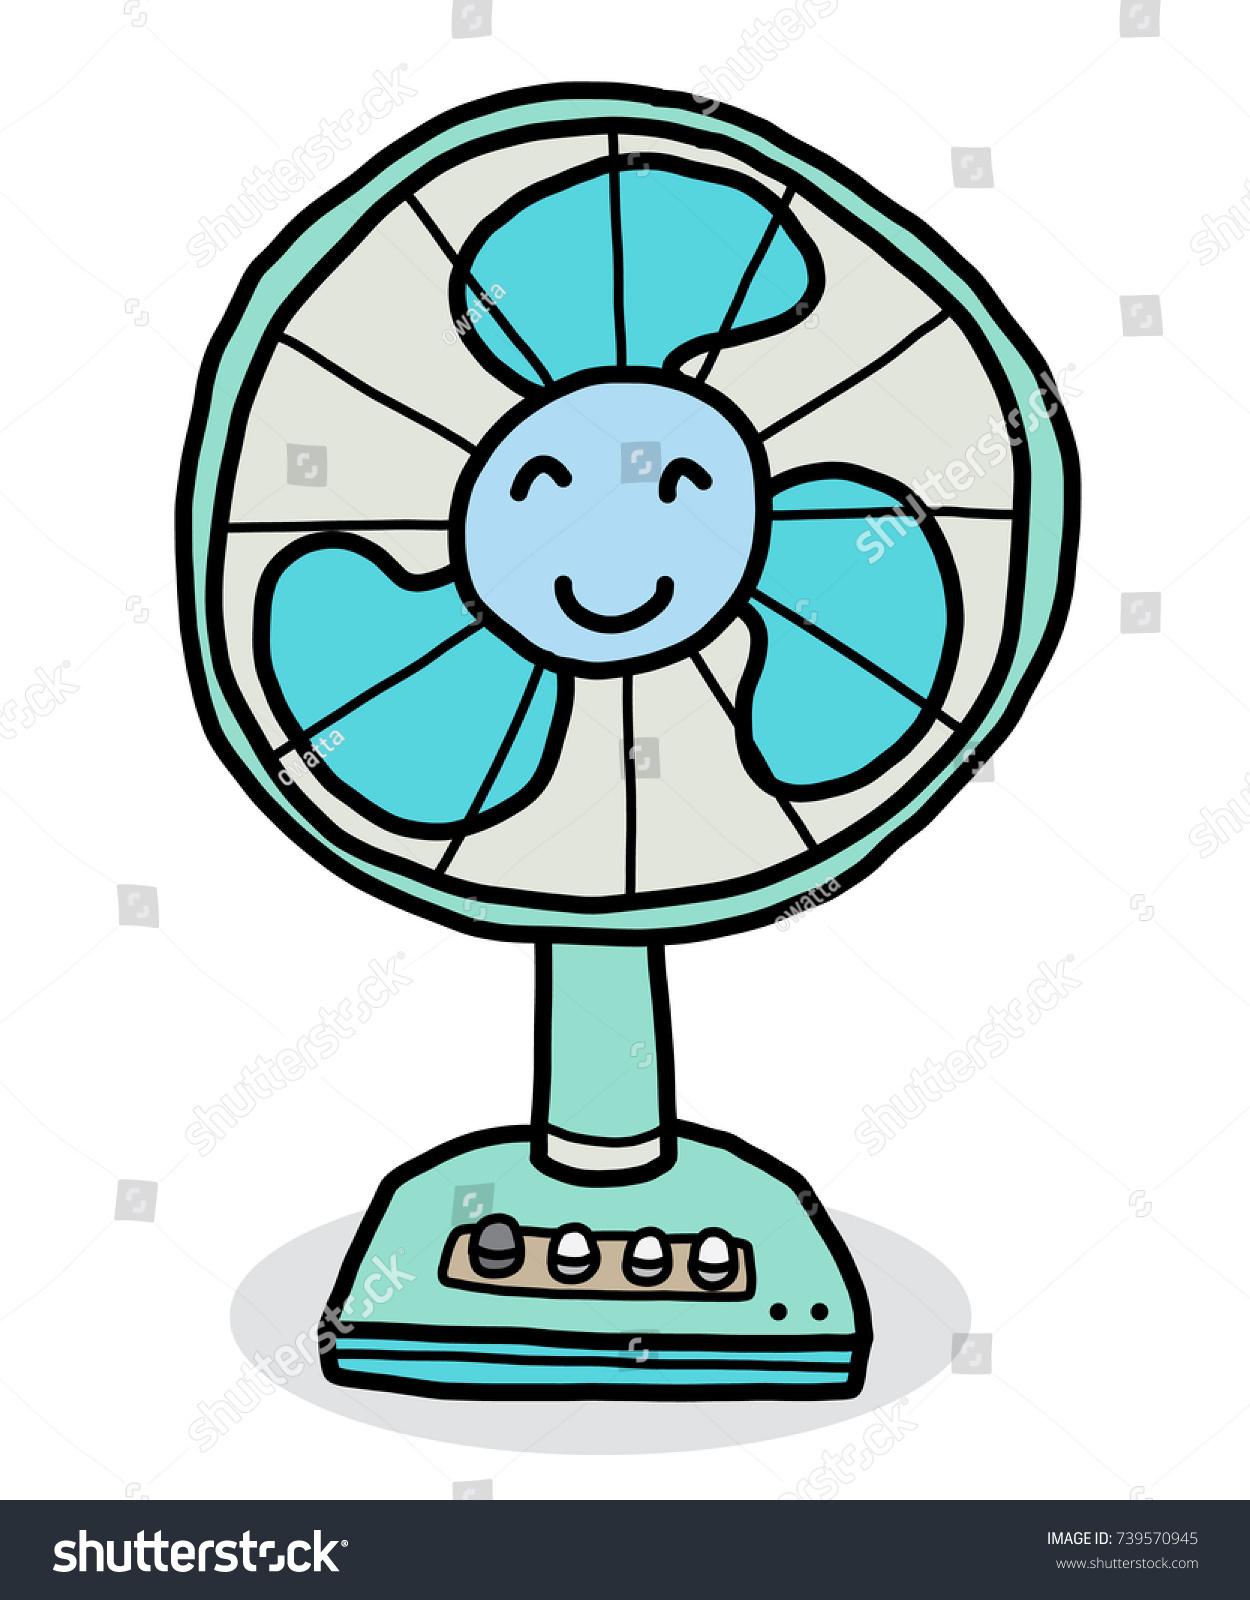 Electric Fan Cartoon : Smile electric fan cartoon vector illustration stock